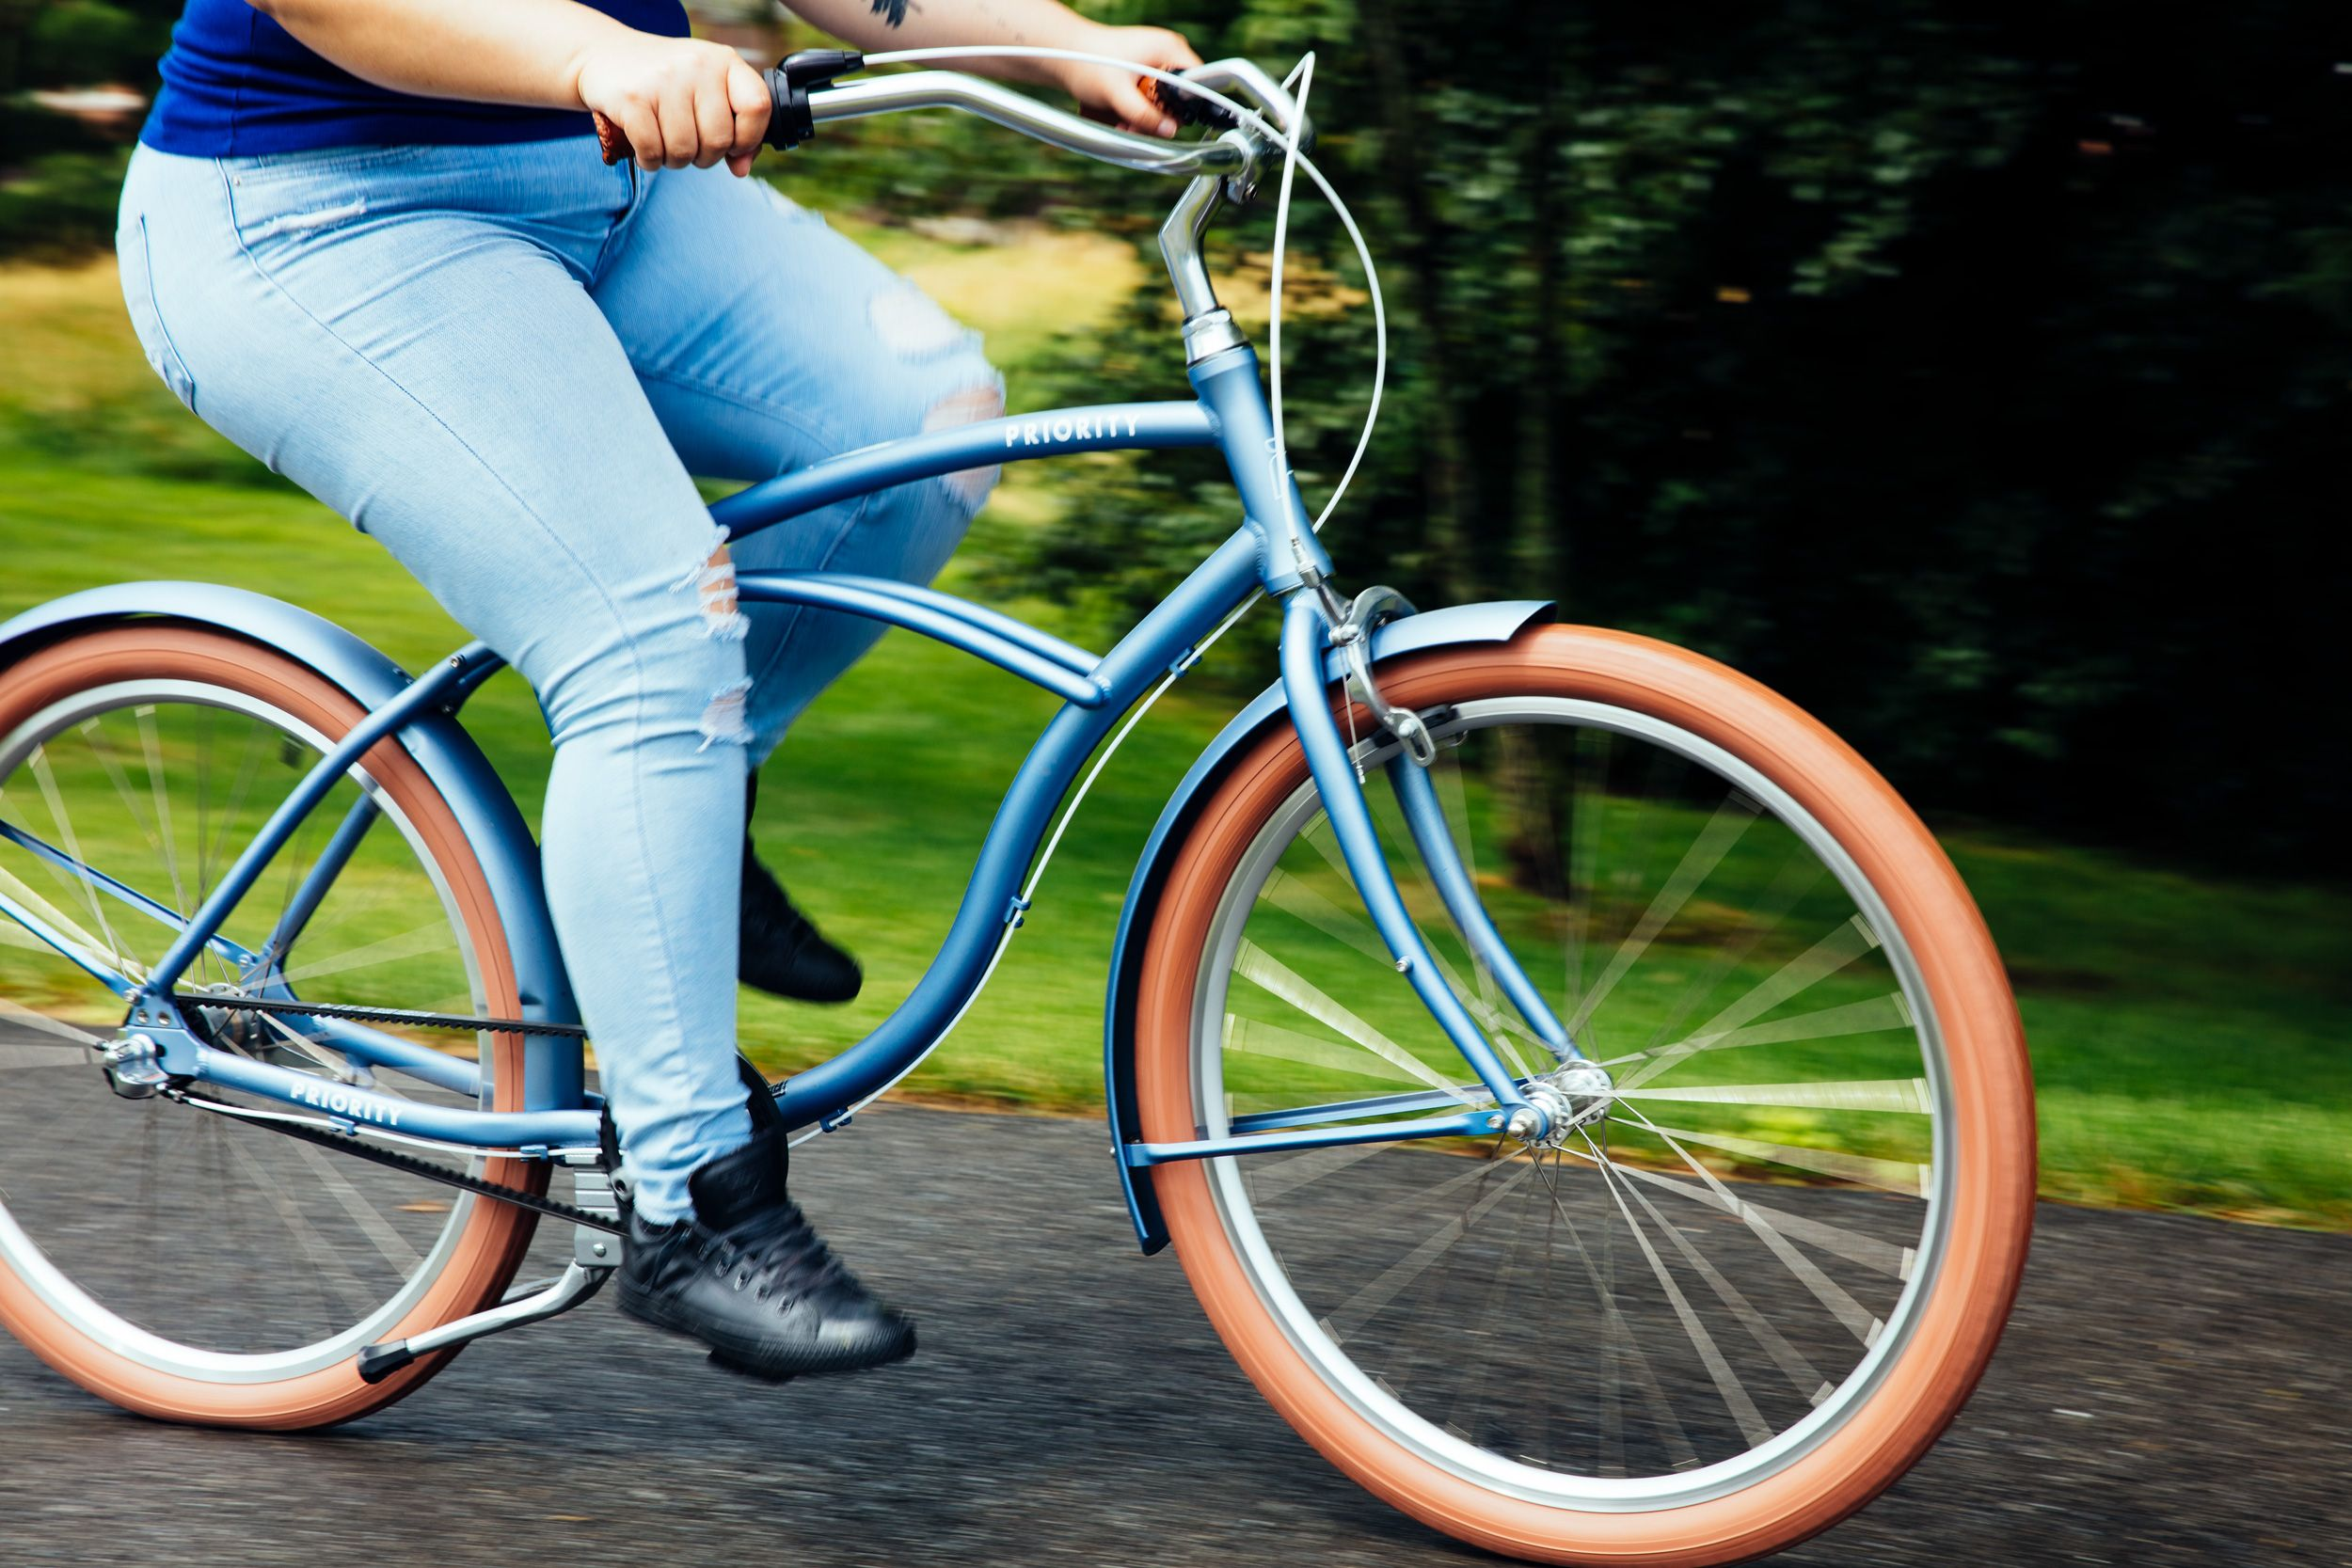 electra bike cruiser pink adult